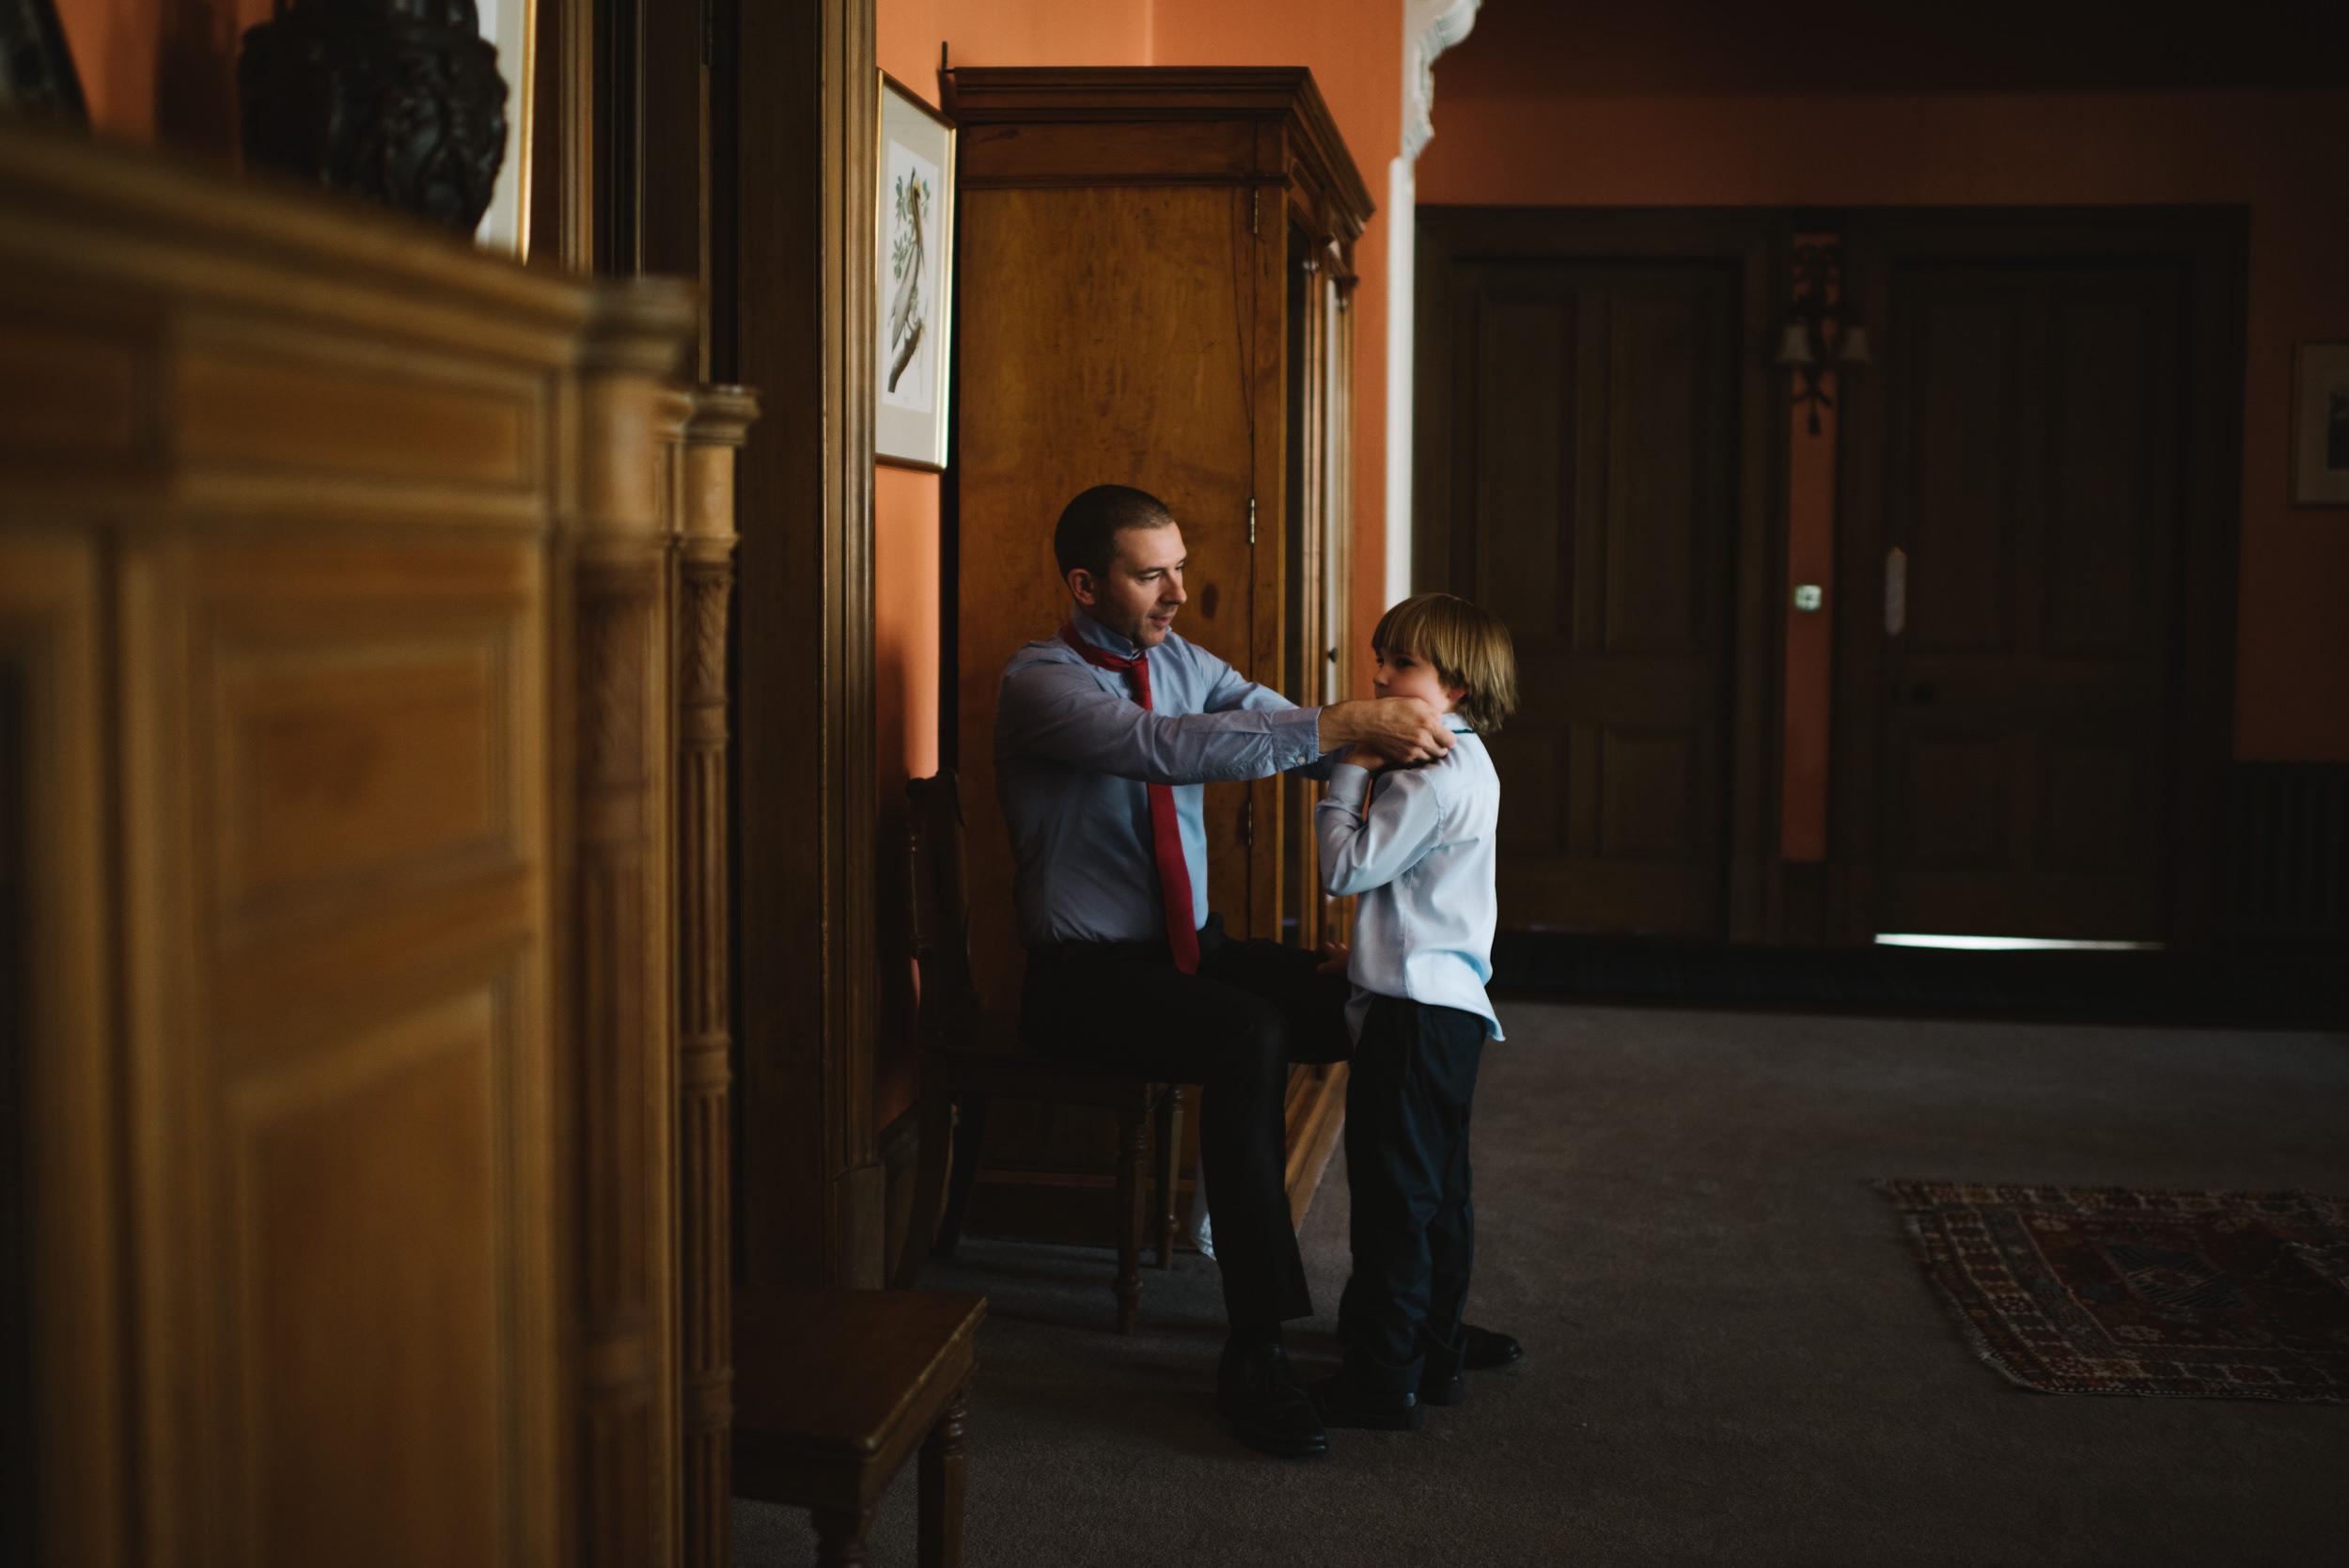 0141-alternative-wedding-portrait-family-kids-photographer-glasgow-scotland.JPG